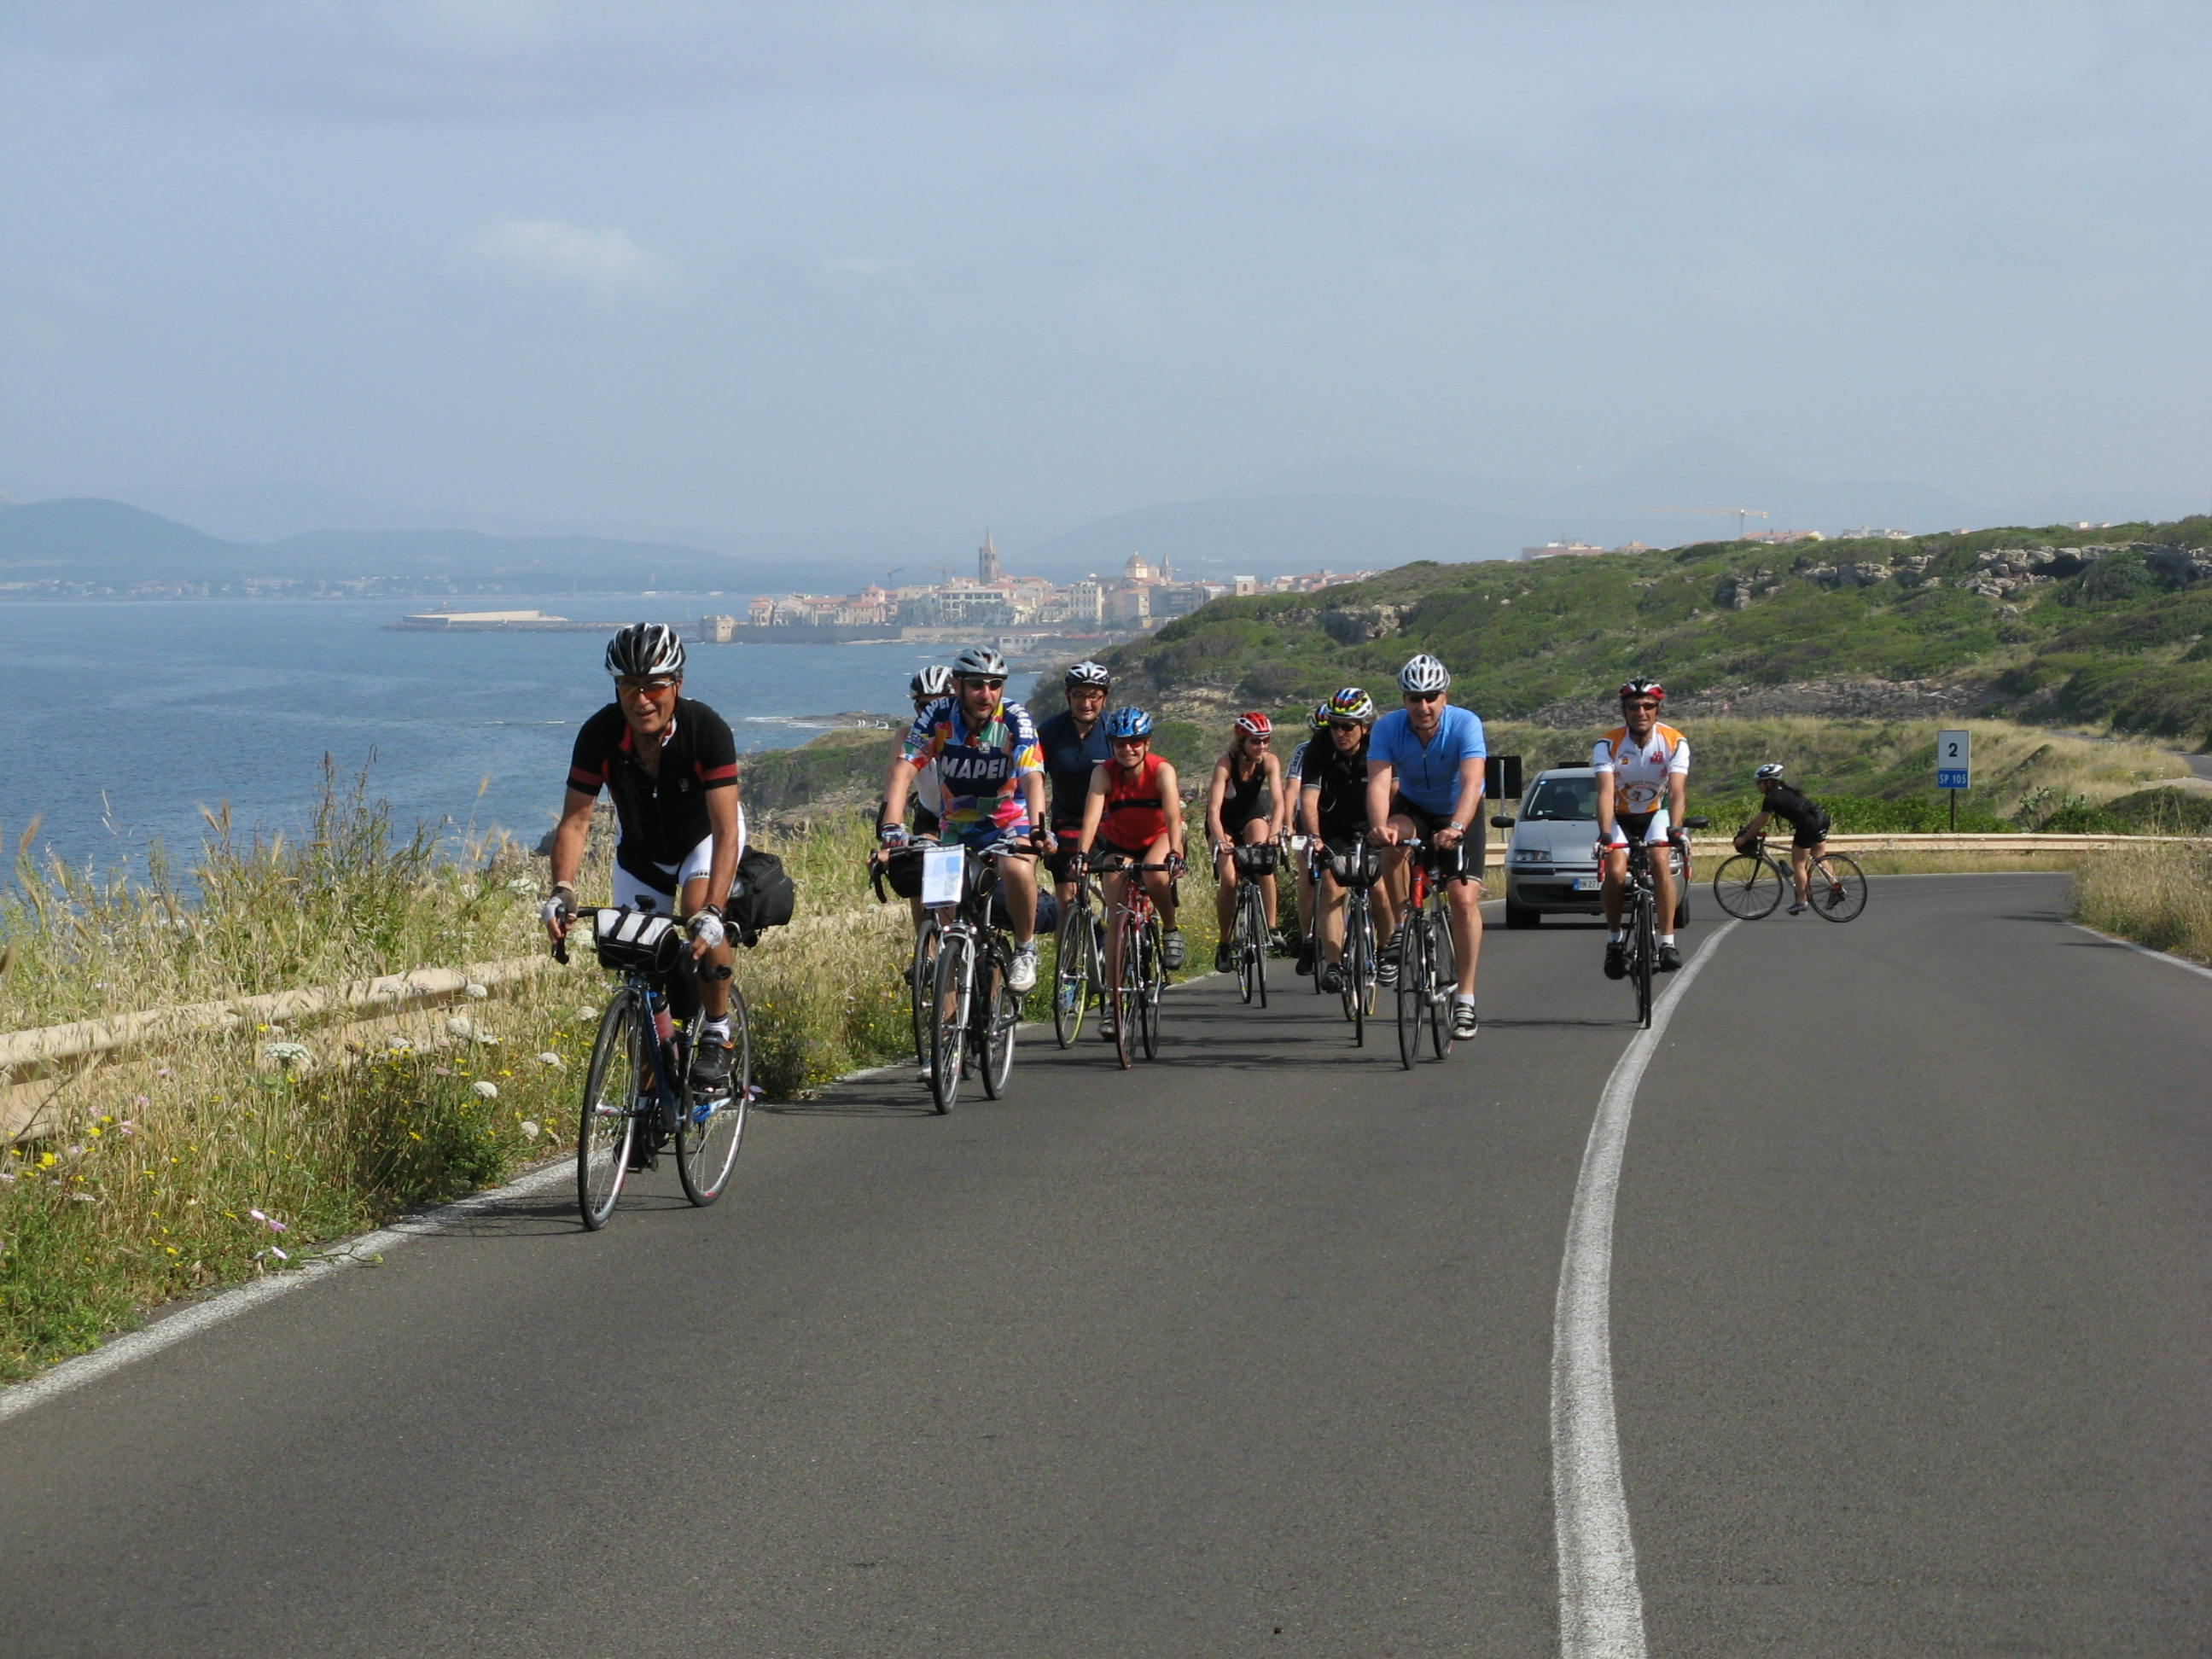 Coast-to-coast 2010-Sardegna 051jpg